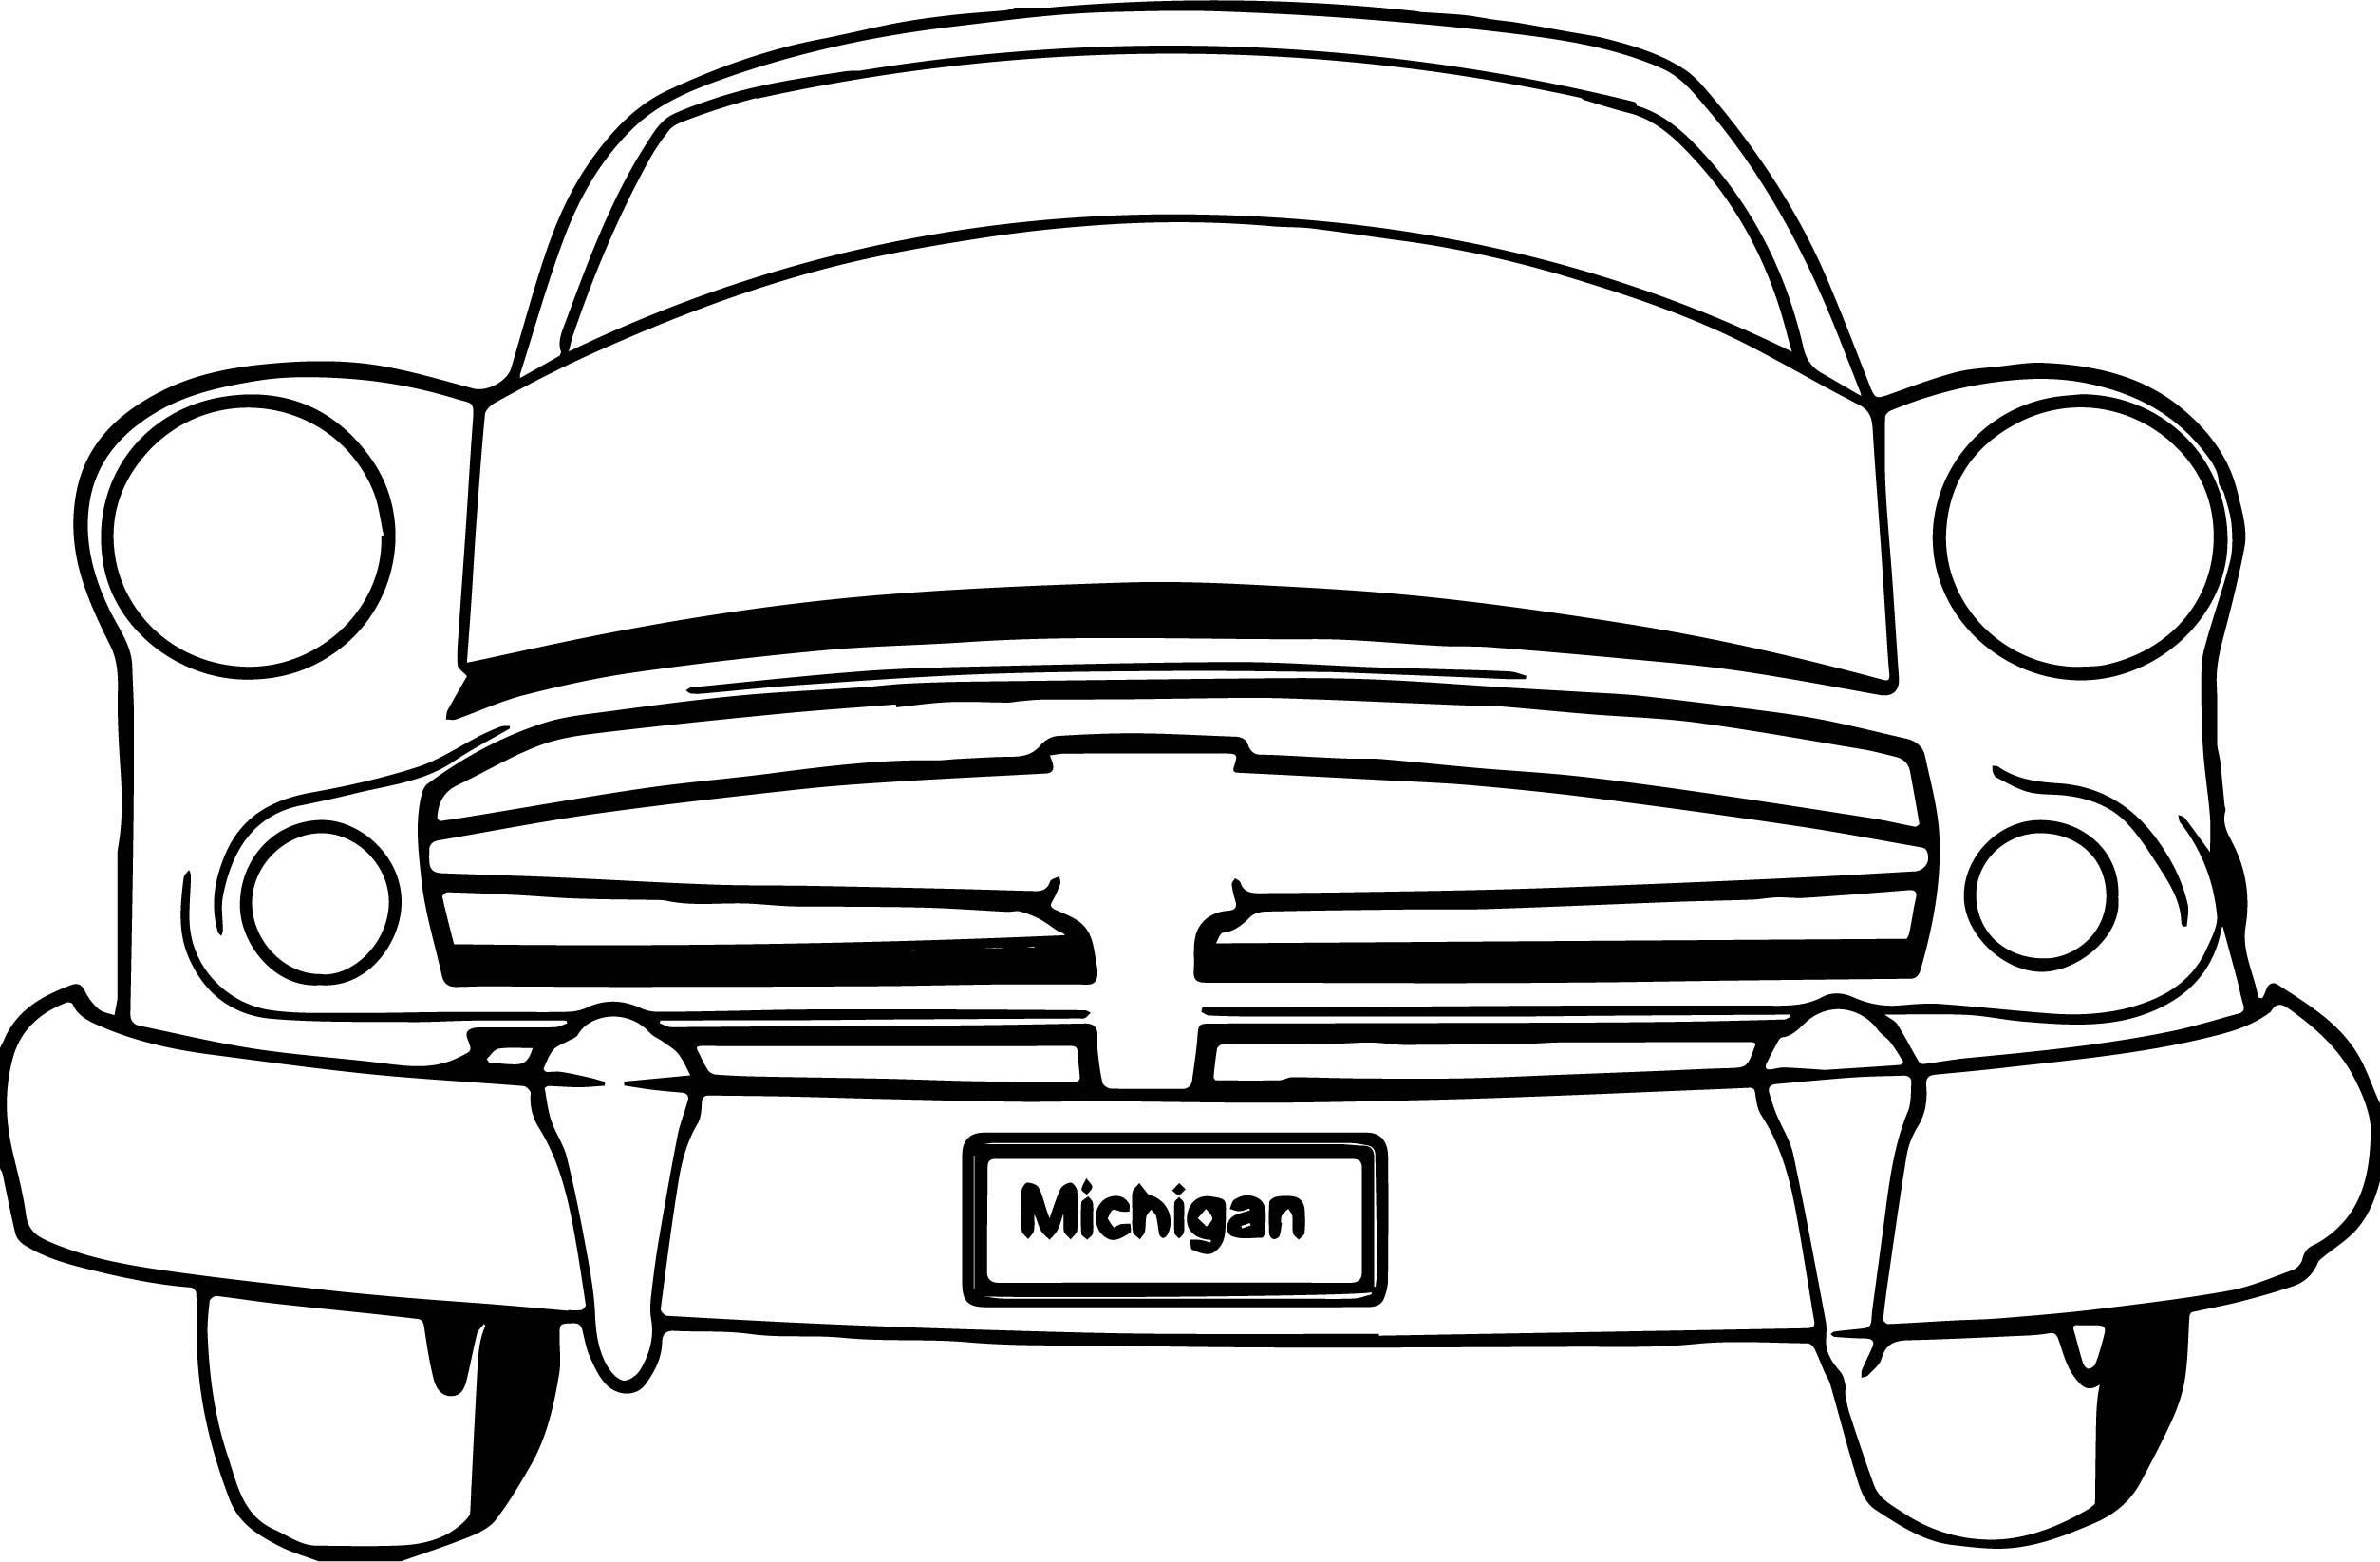 Michigan Car Coloring Page